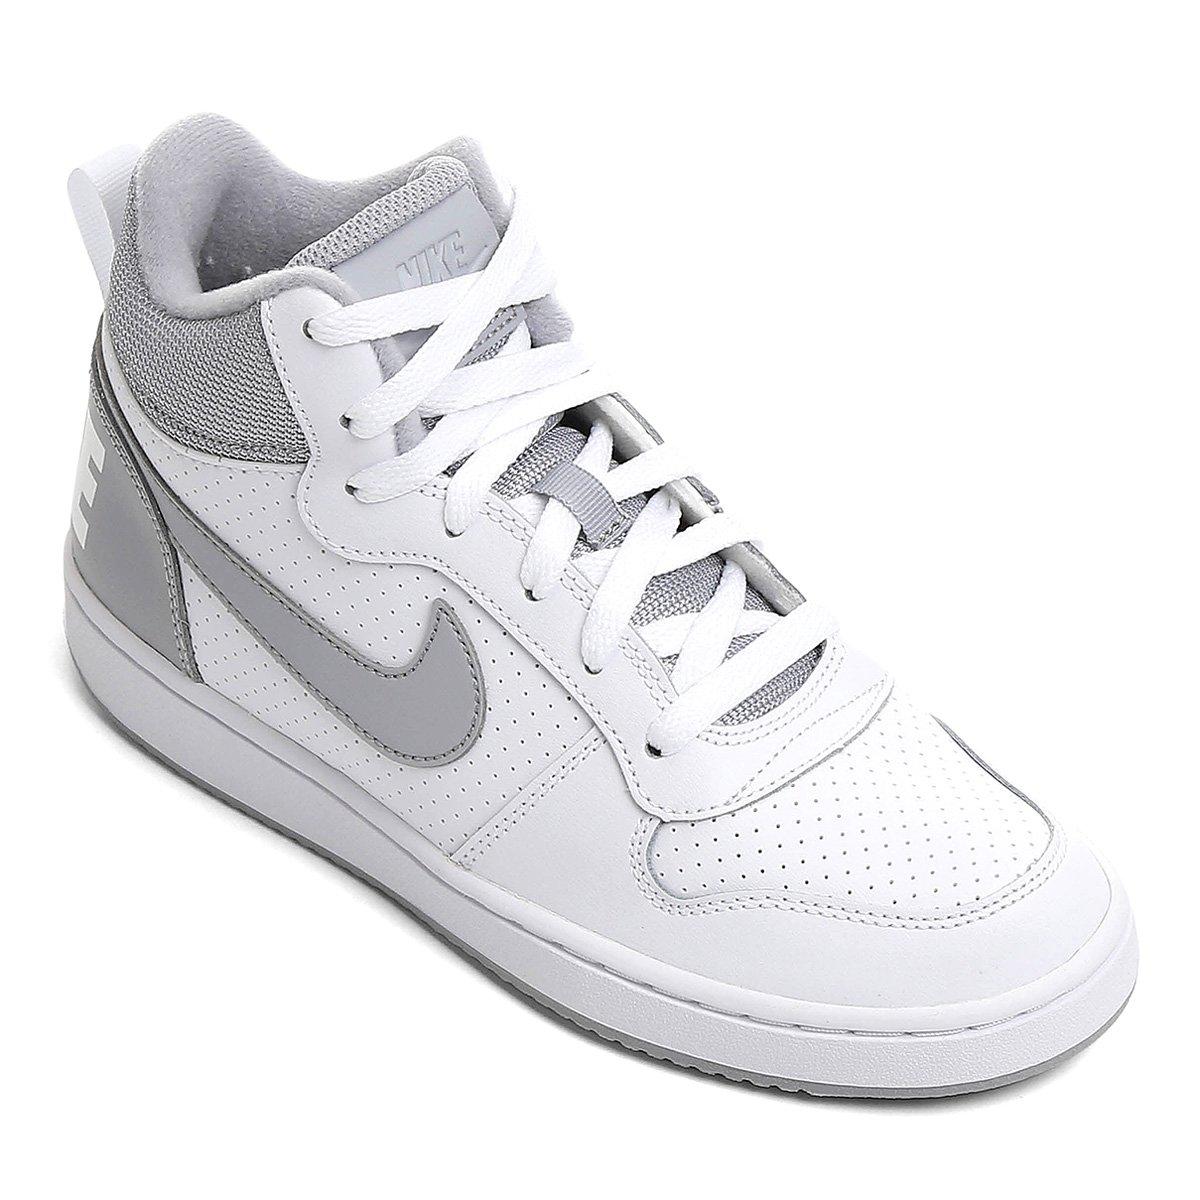 847f1af488 Tênis Infantil Nike Court Borough Mid Masculino - Branco e Cinza ...